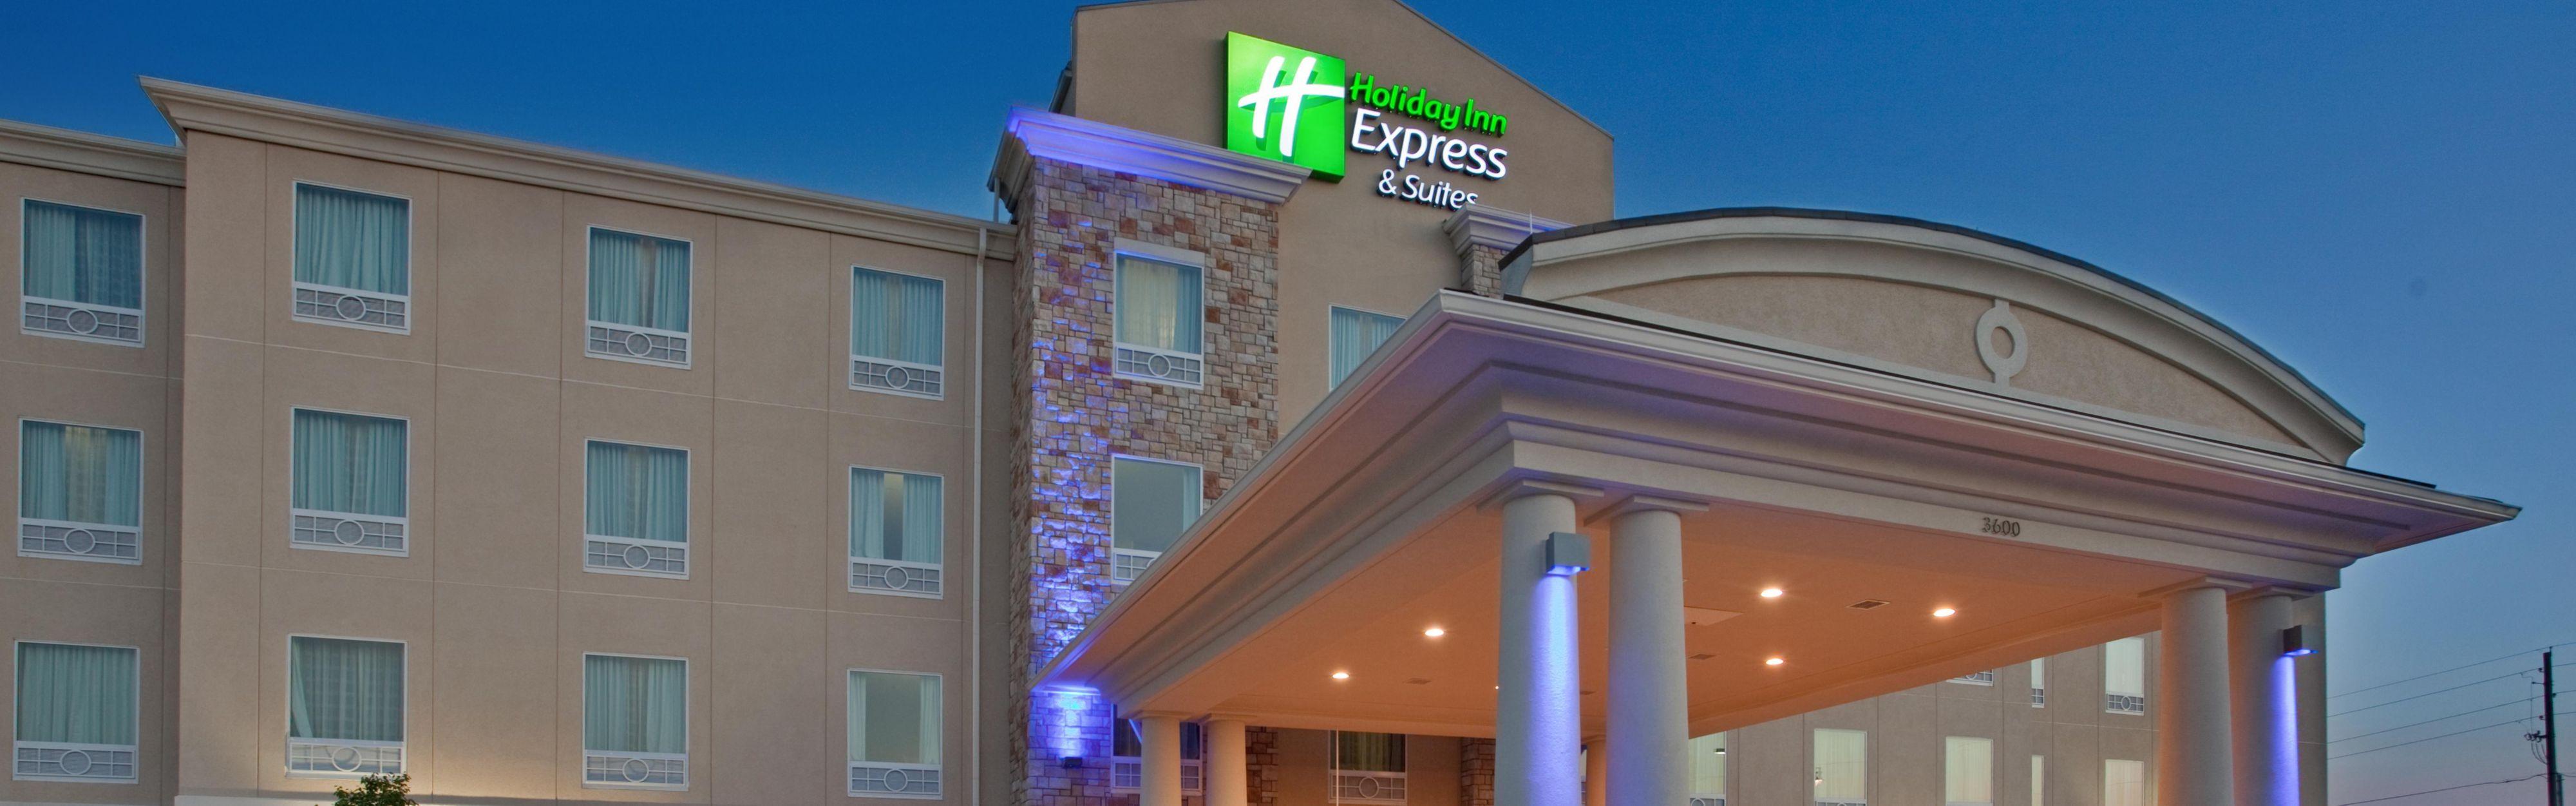 Holiday Inn Express & Suites St. Joseph image 0